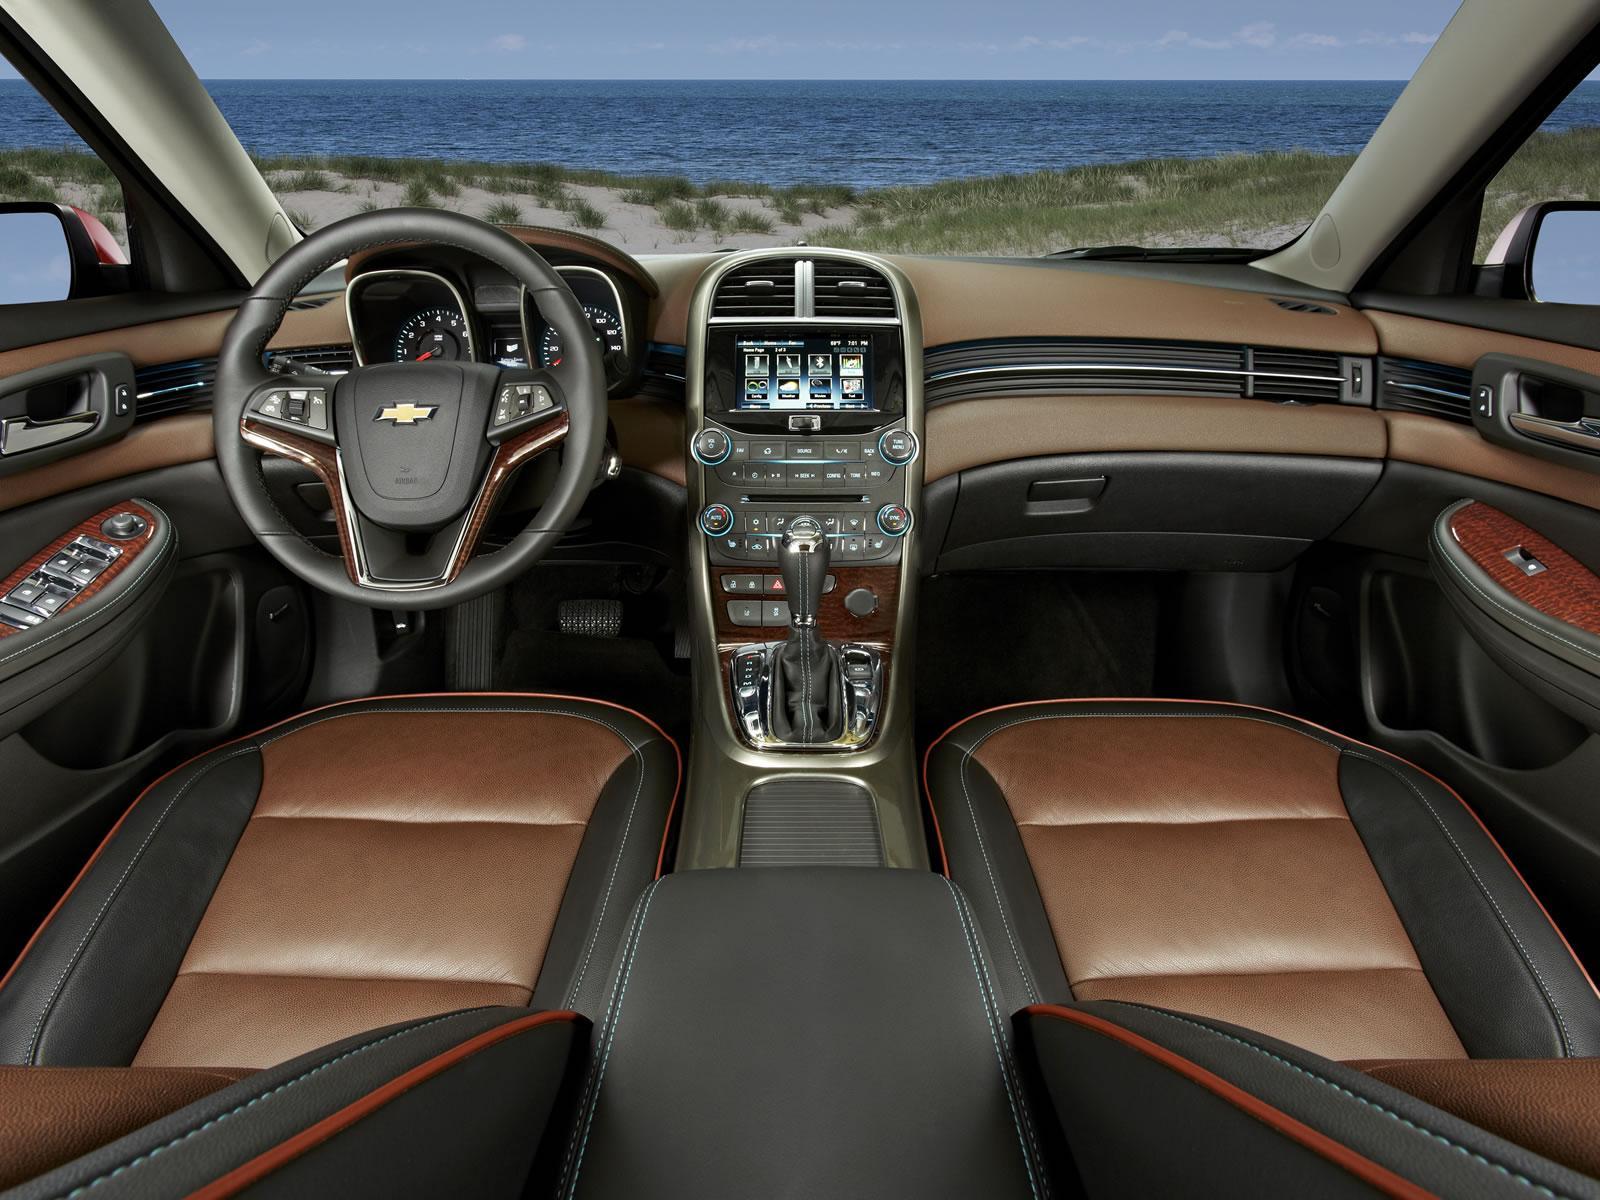 Chevrolet Malibu 2013 Llega A M 233 Xico Desde 325 700 Pesos